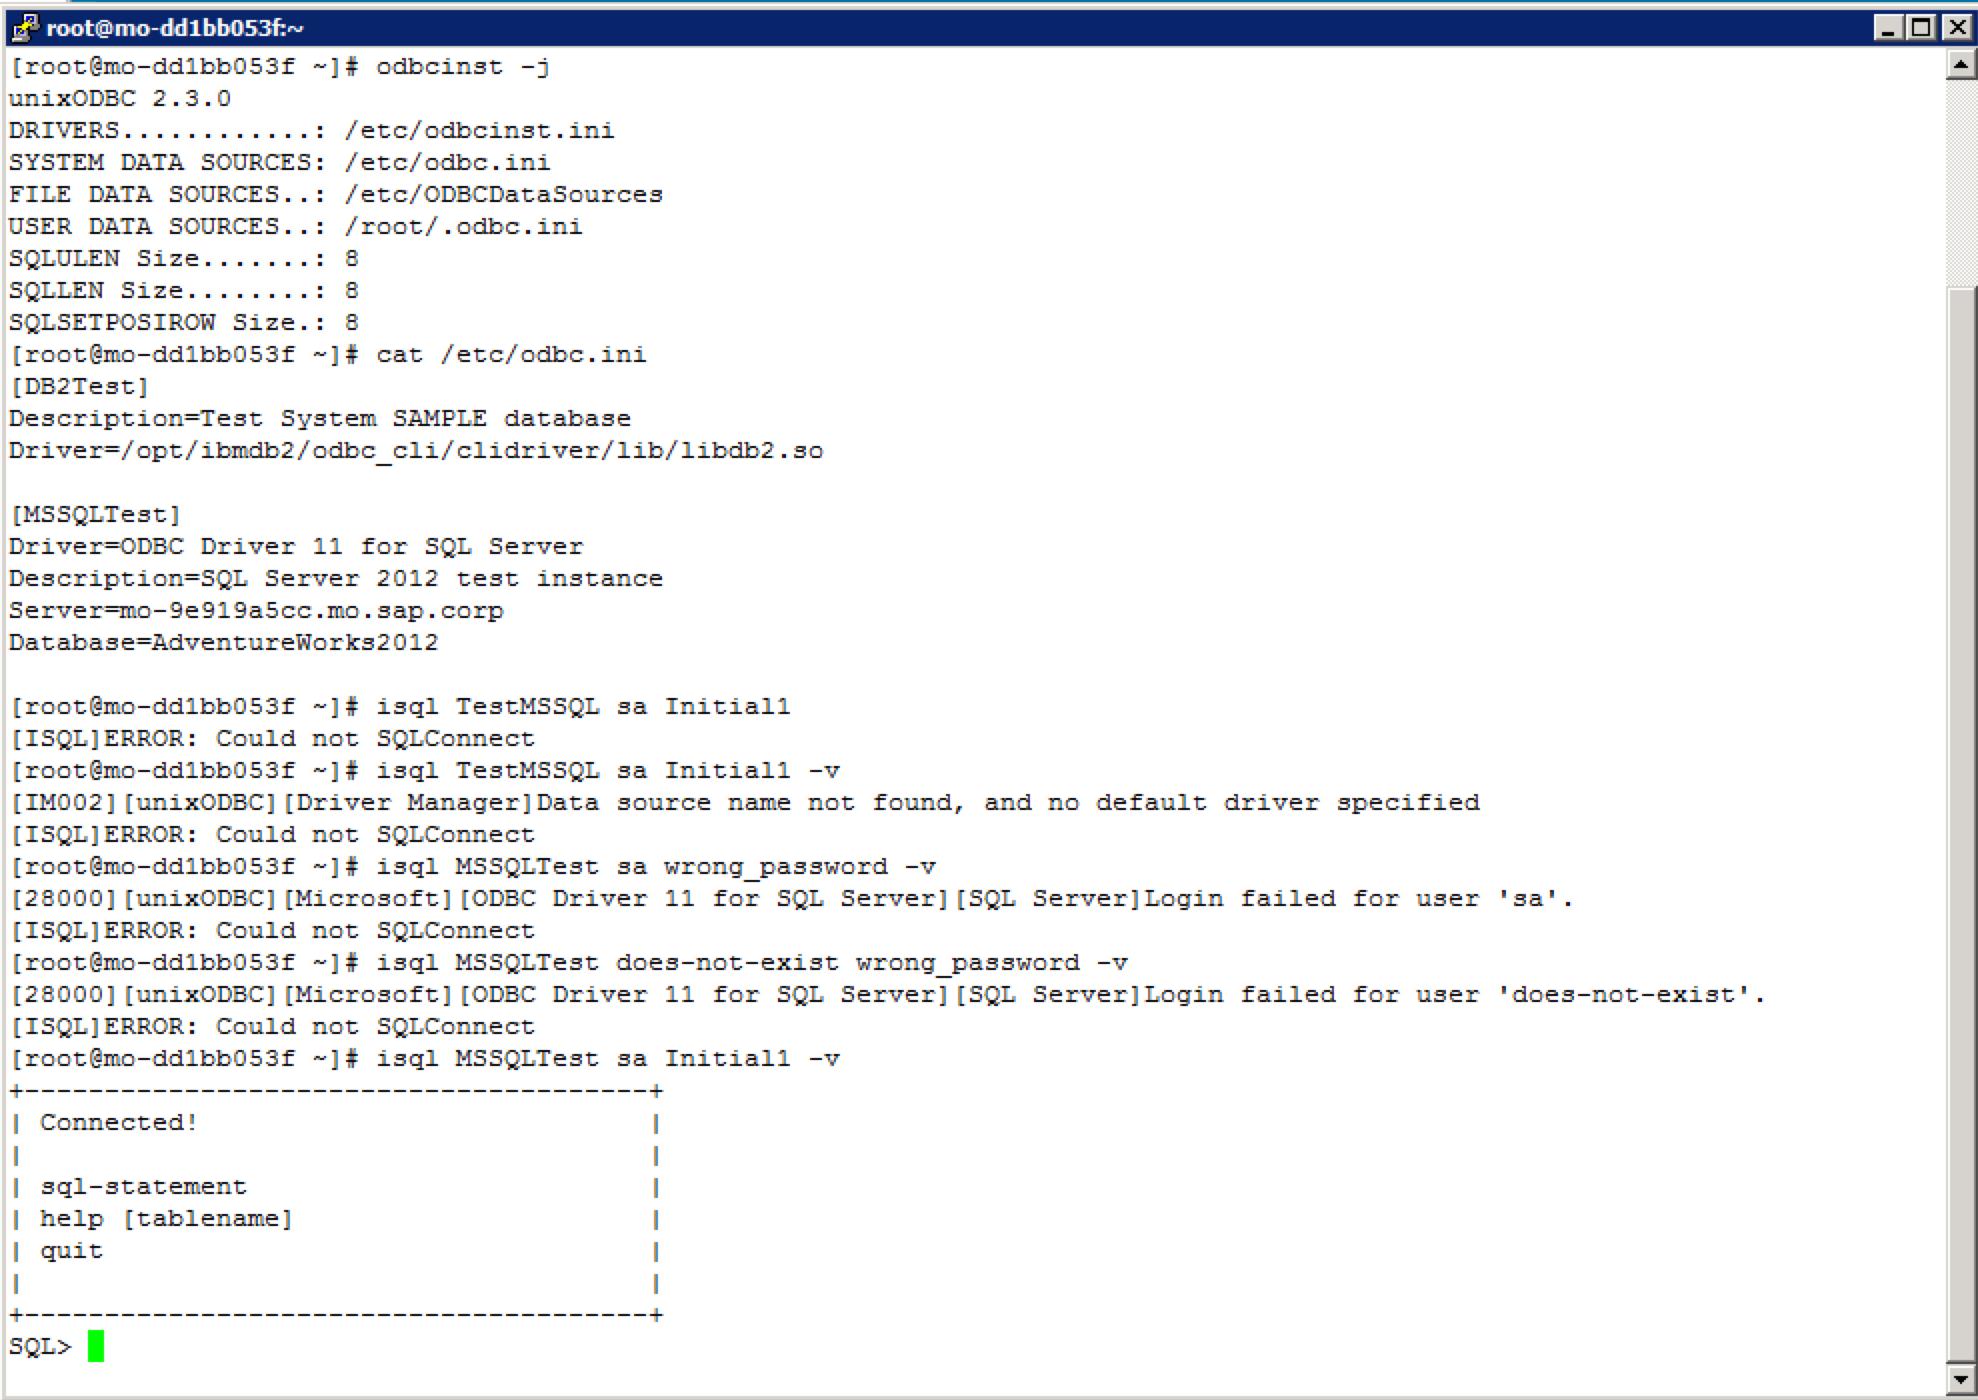 NEW DRIVERS: AIX SQL SERVER ODBC